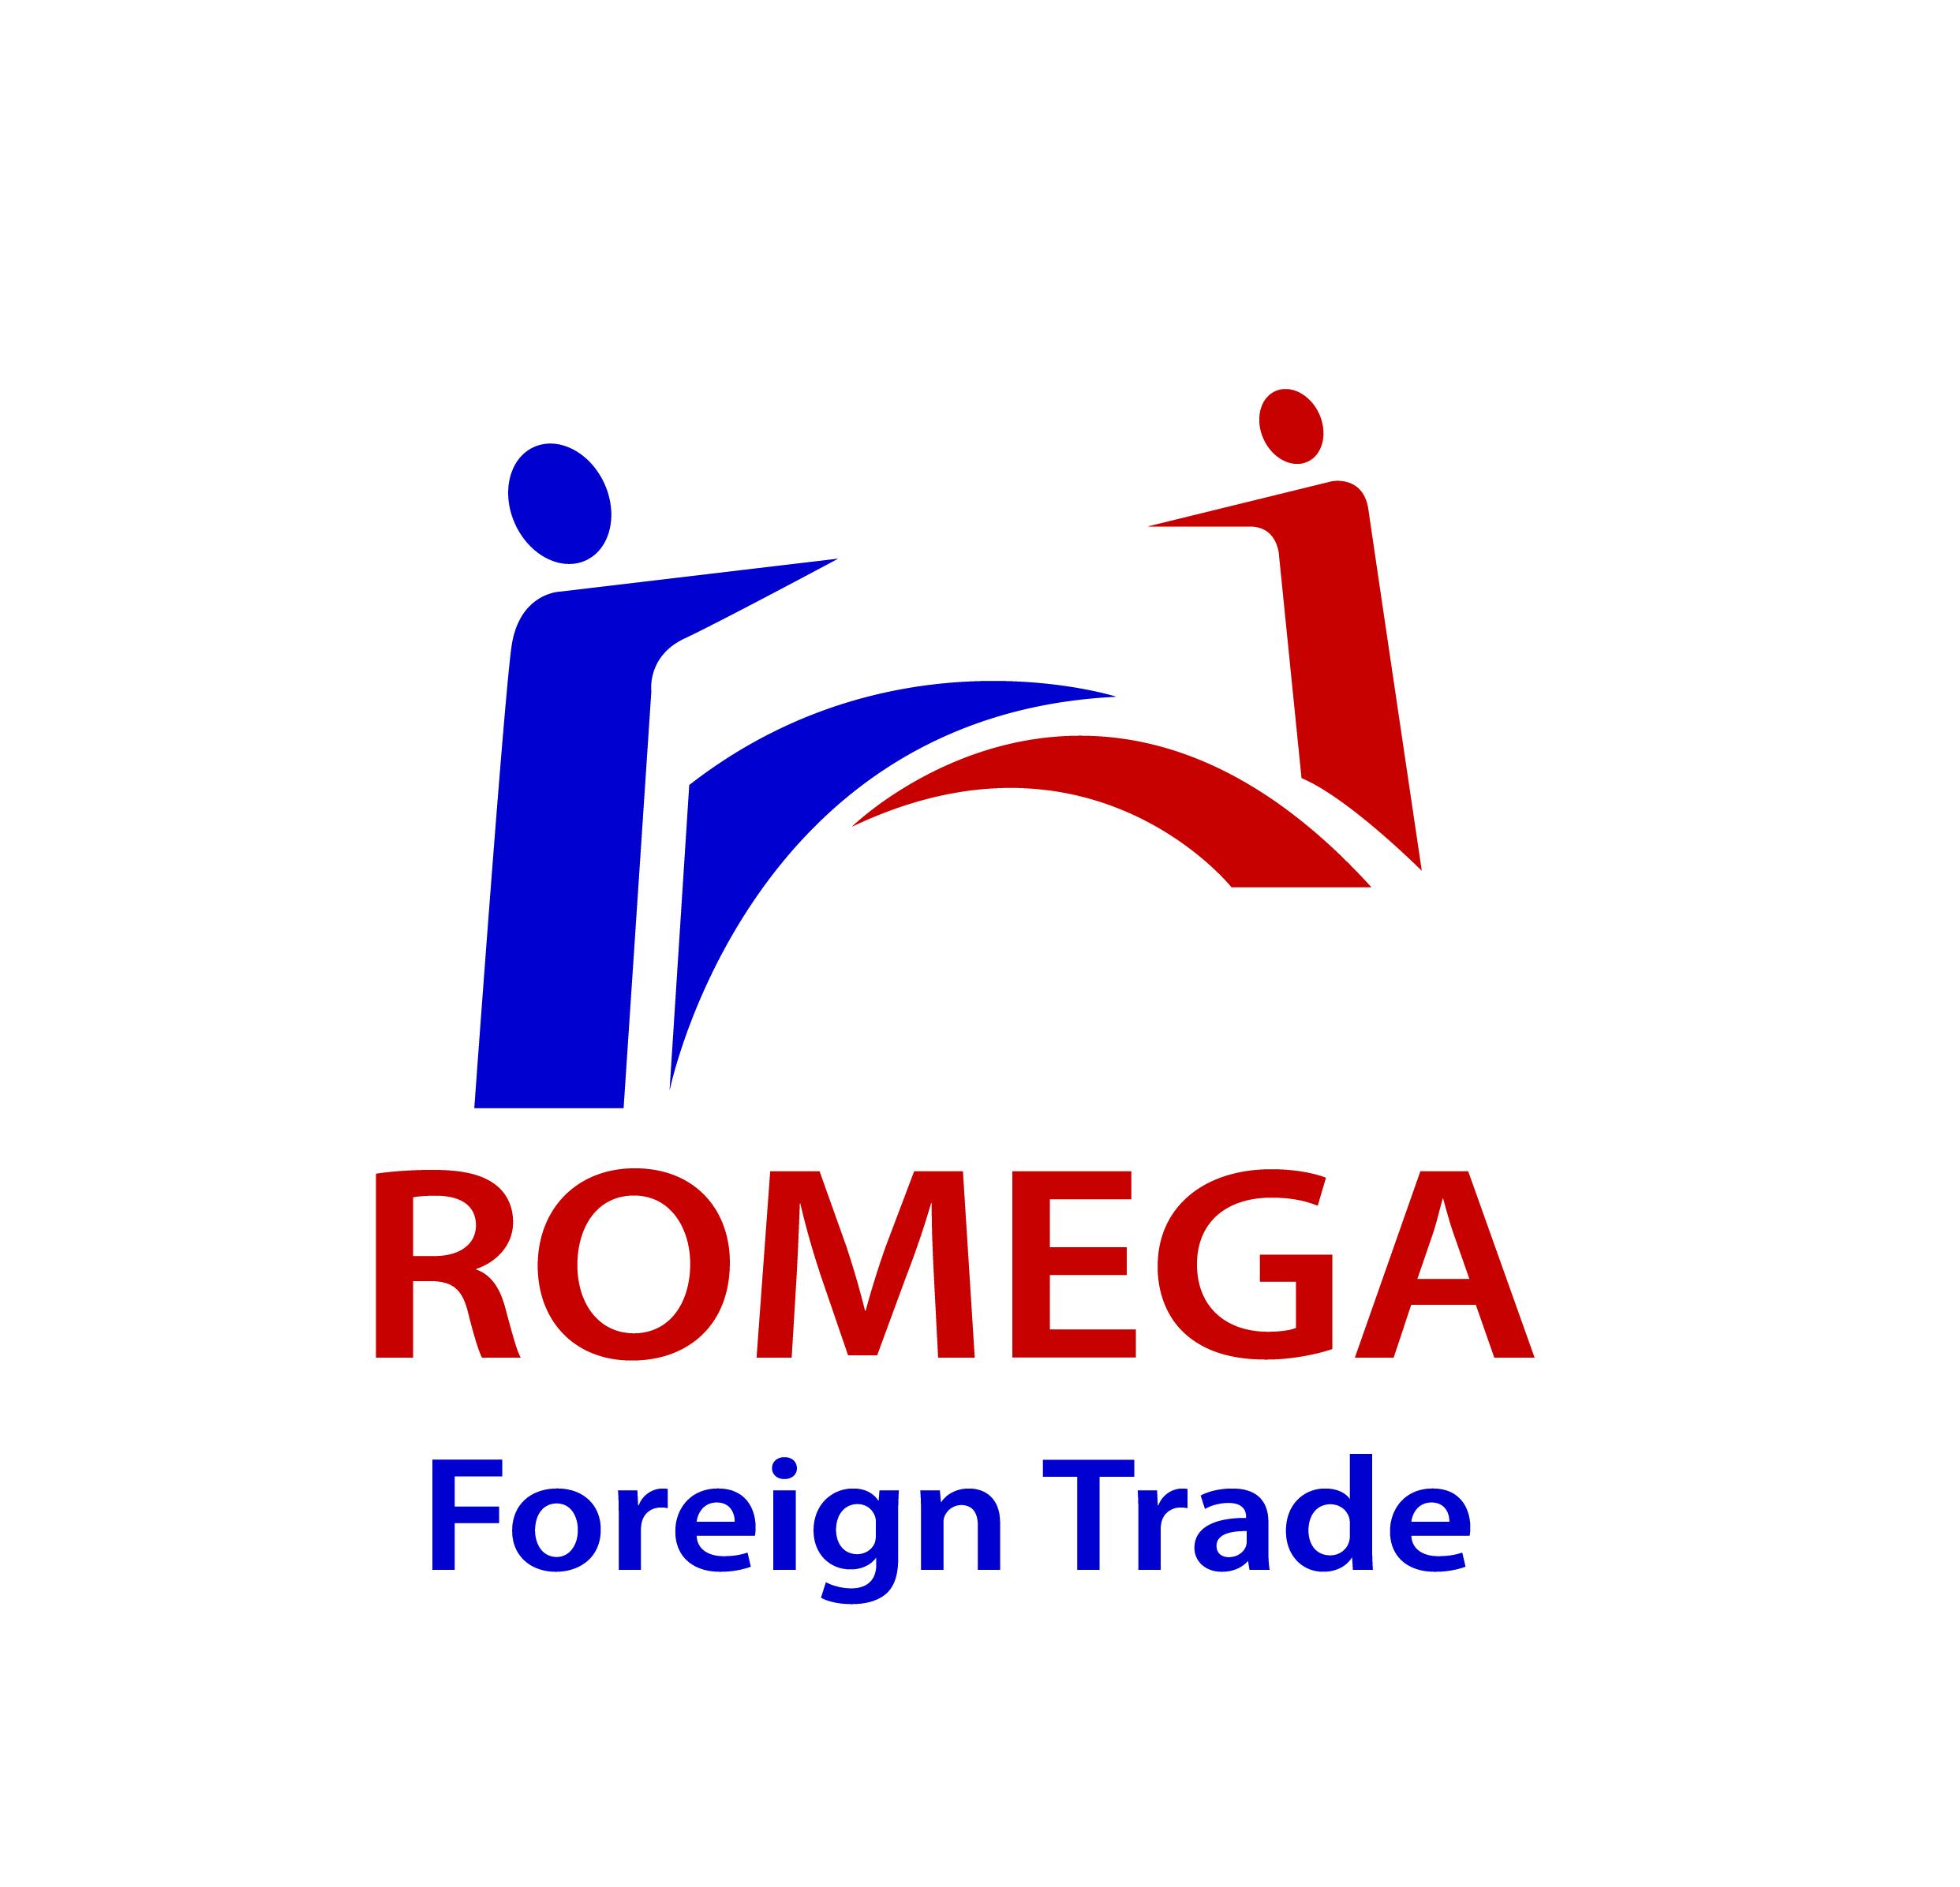 ROMEGA DIŞ TİCARET LİMİTED ŞİRKETİ, Romega Foreign Trade